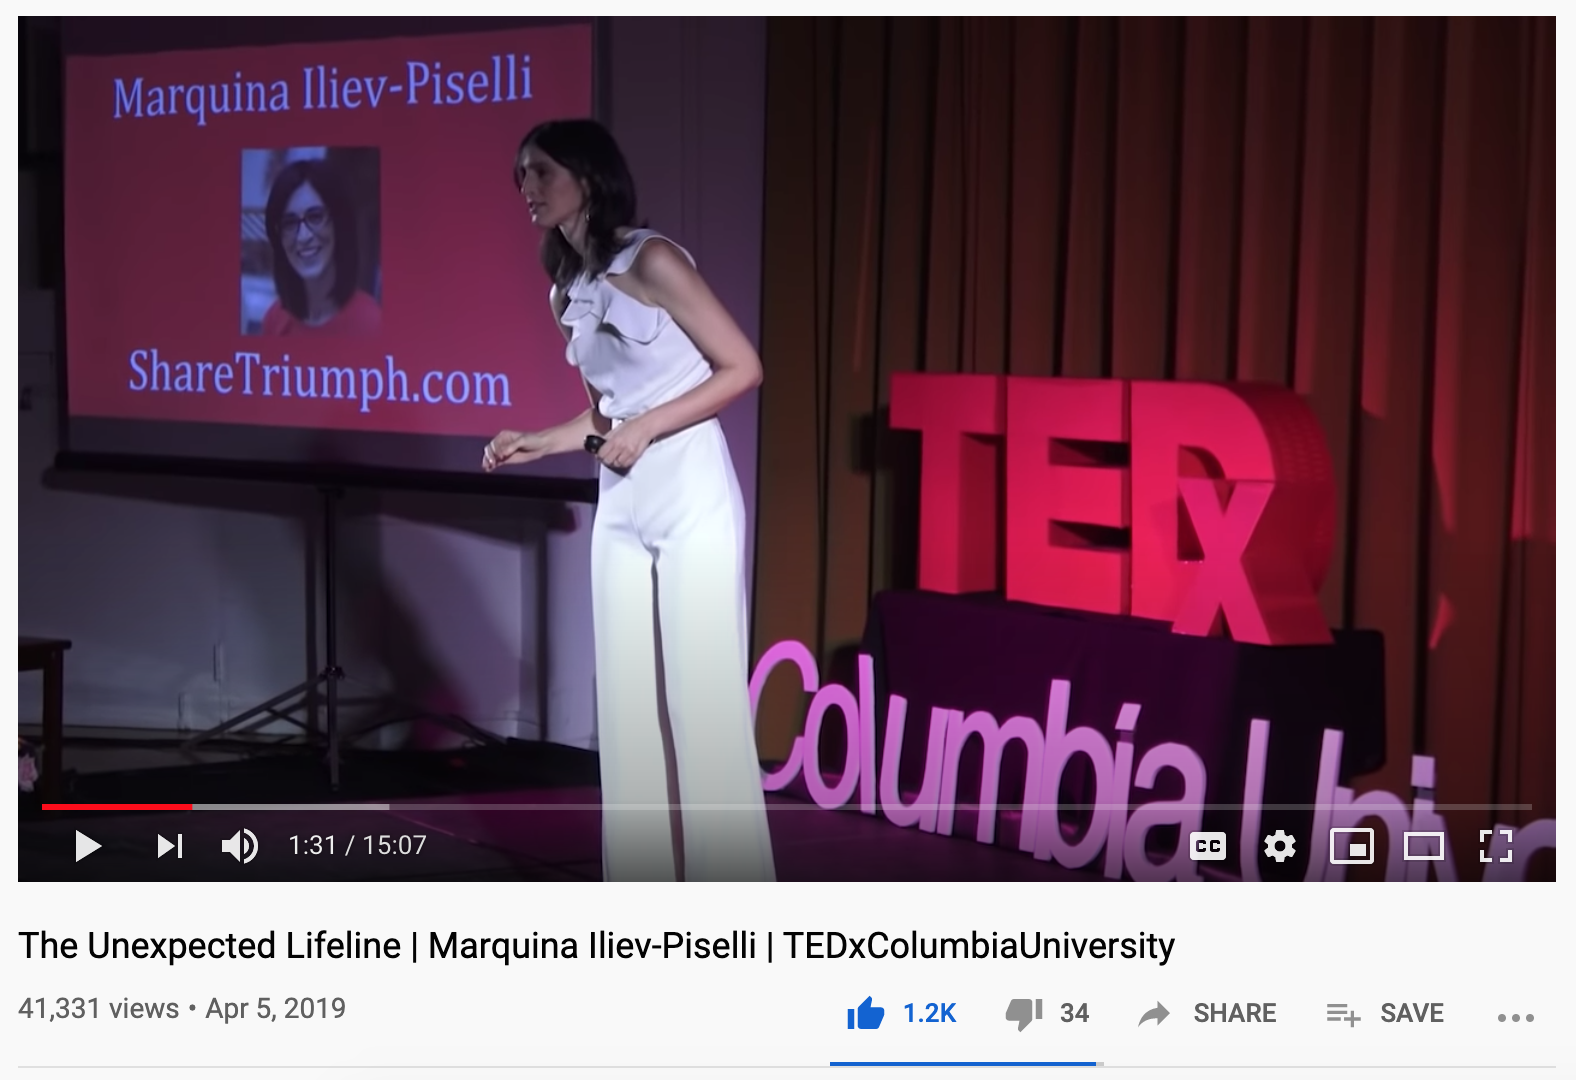 Marquina at TEDx Columbia University